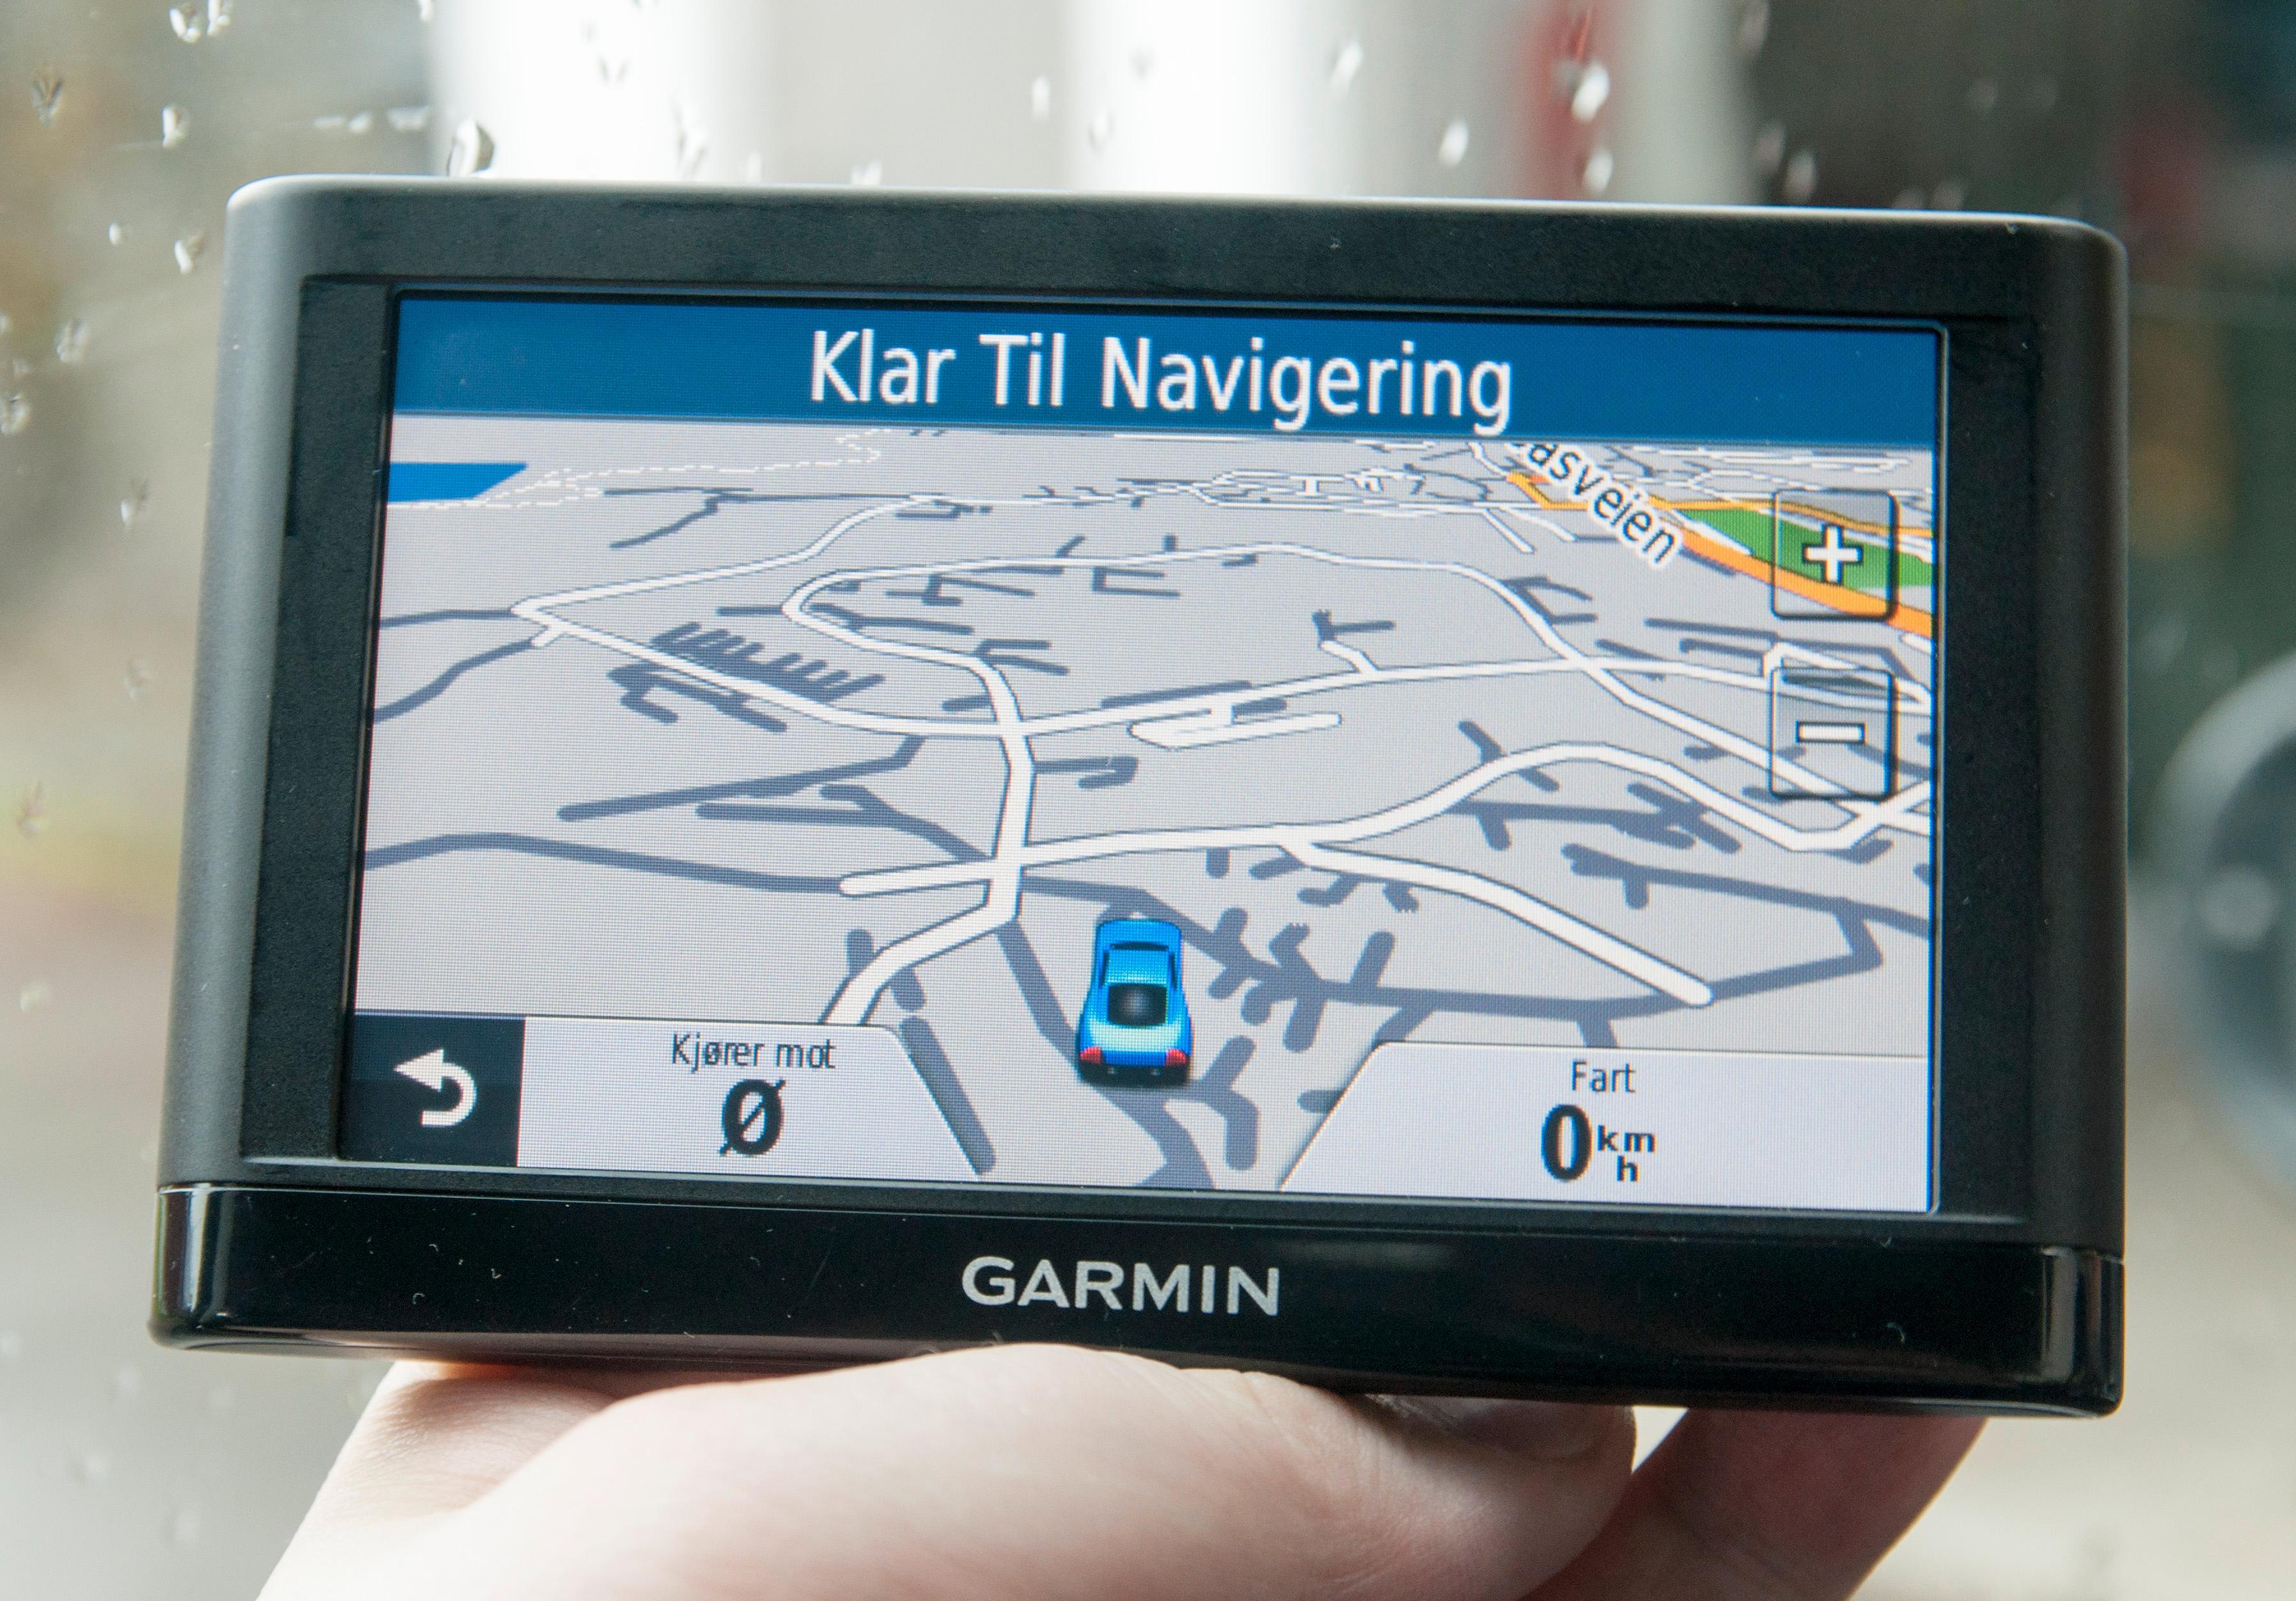 Kartvisningen fra Nüvi 54 LM. Normalt viser den langt flere veinavn i periferien rundt, men akkurat i dette området gjorde den det ikke.Foto: Finn Jarle Kvalheim, Amobil.no